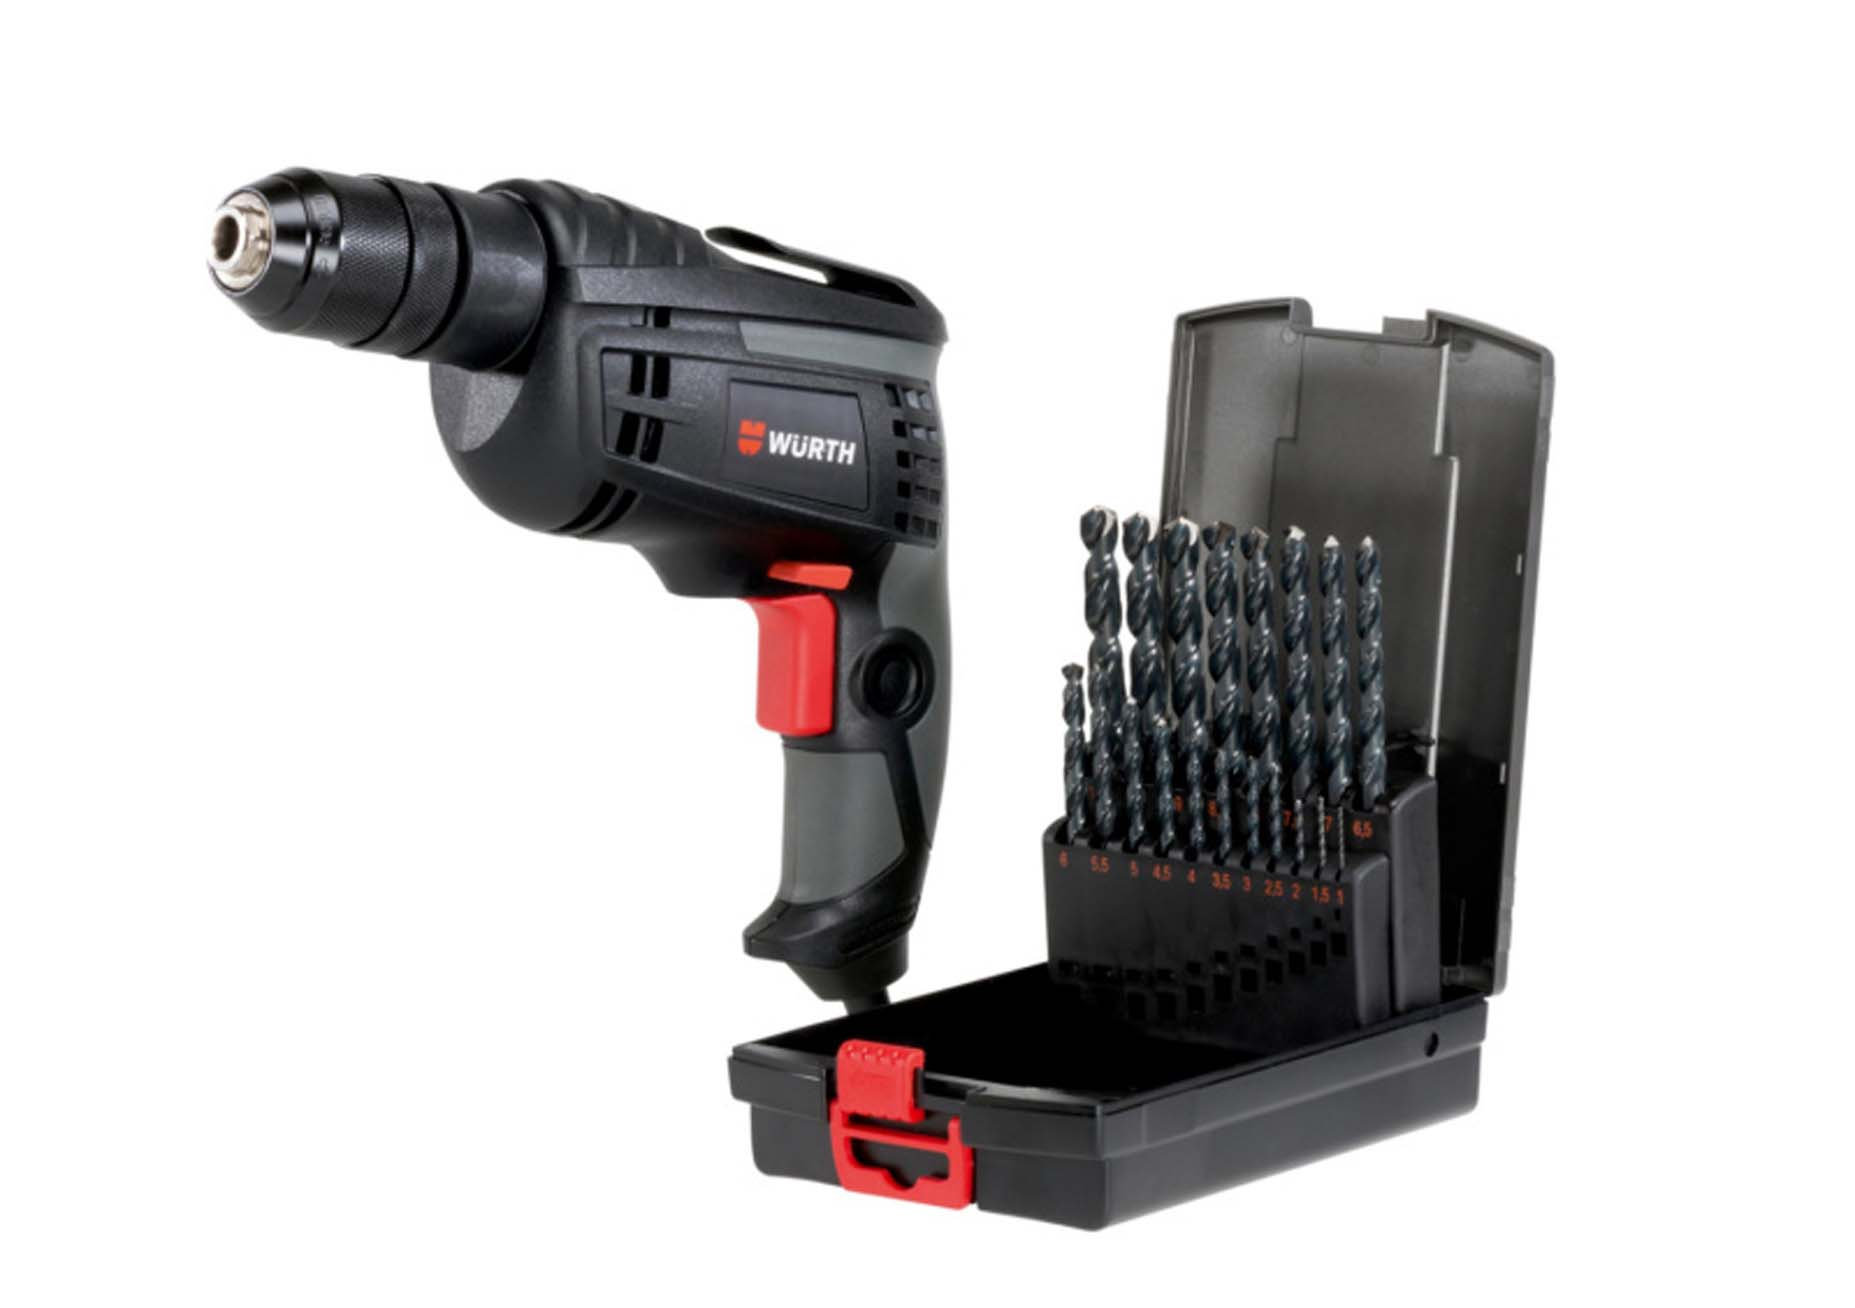 Makita 6412 Mesin Bor Drill 10mm 3 Per 8 Inch Hand Pipe Bender Krisbow 7 8in Kw1500520 Wurth Bm 10 E Compact